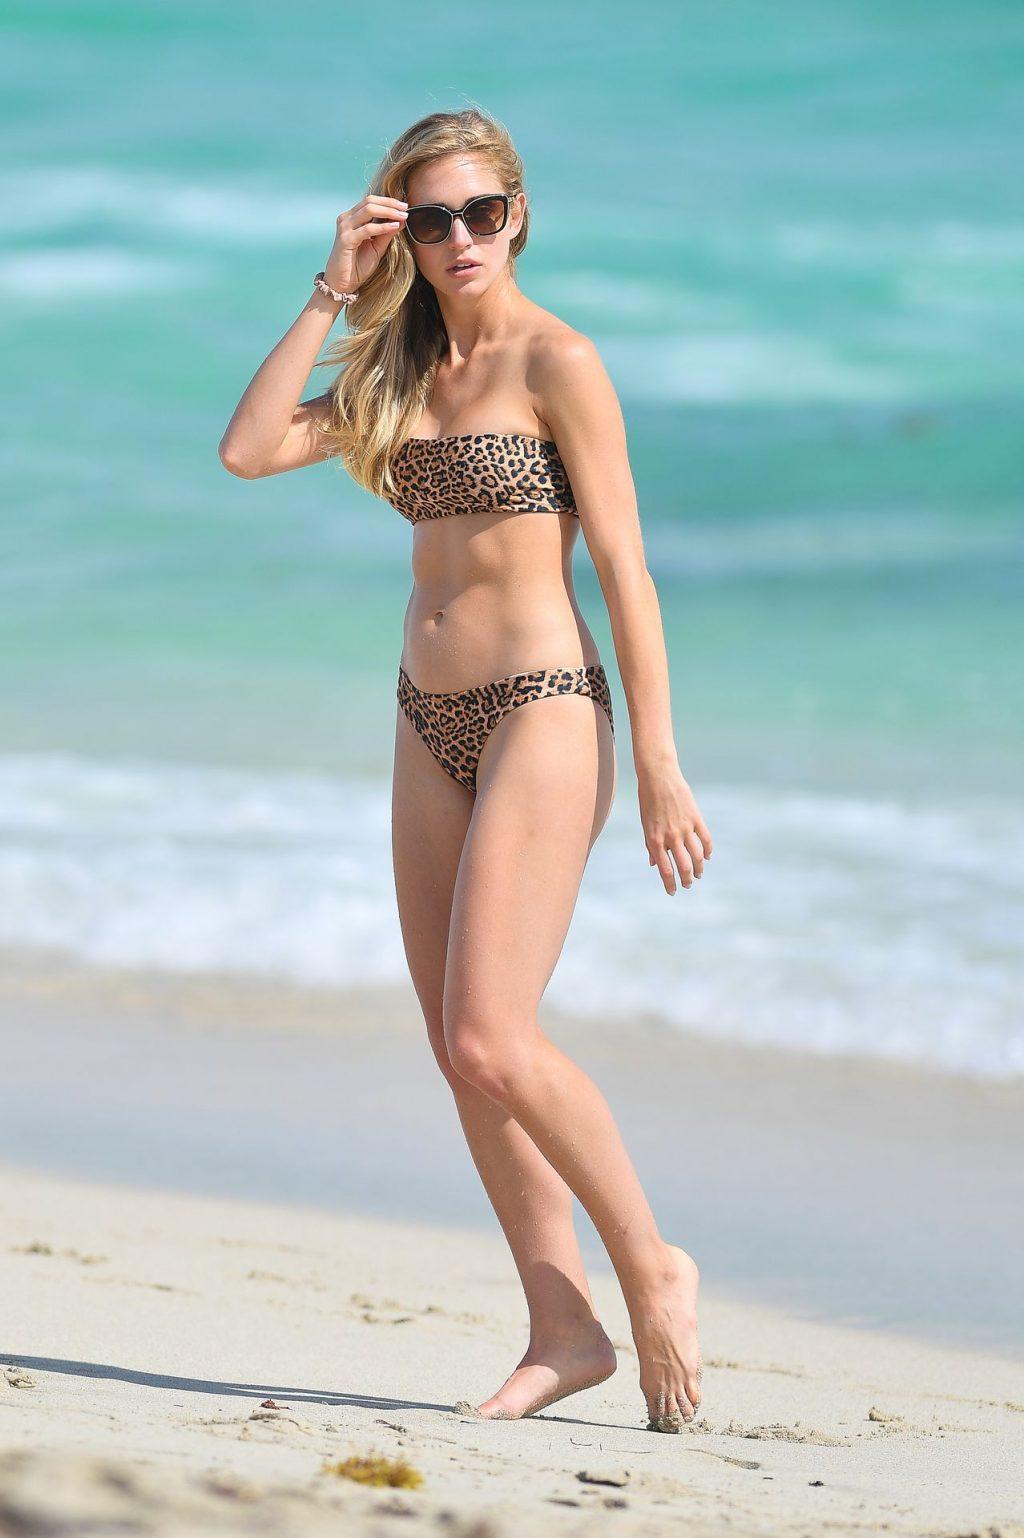 Gilda Joelle Osborn Wears a Leopard Print Bikini (23 Photos)